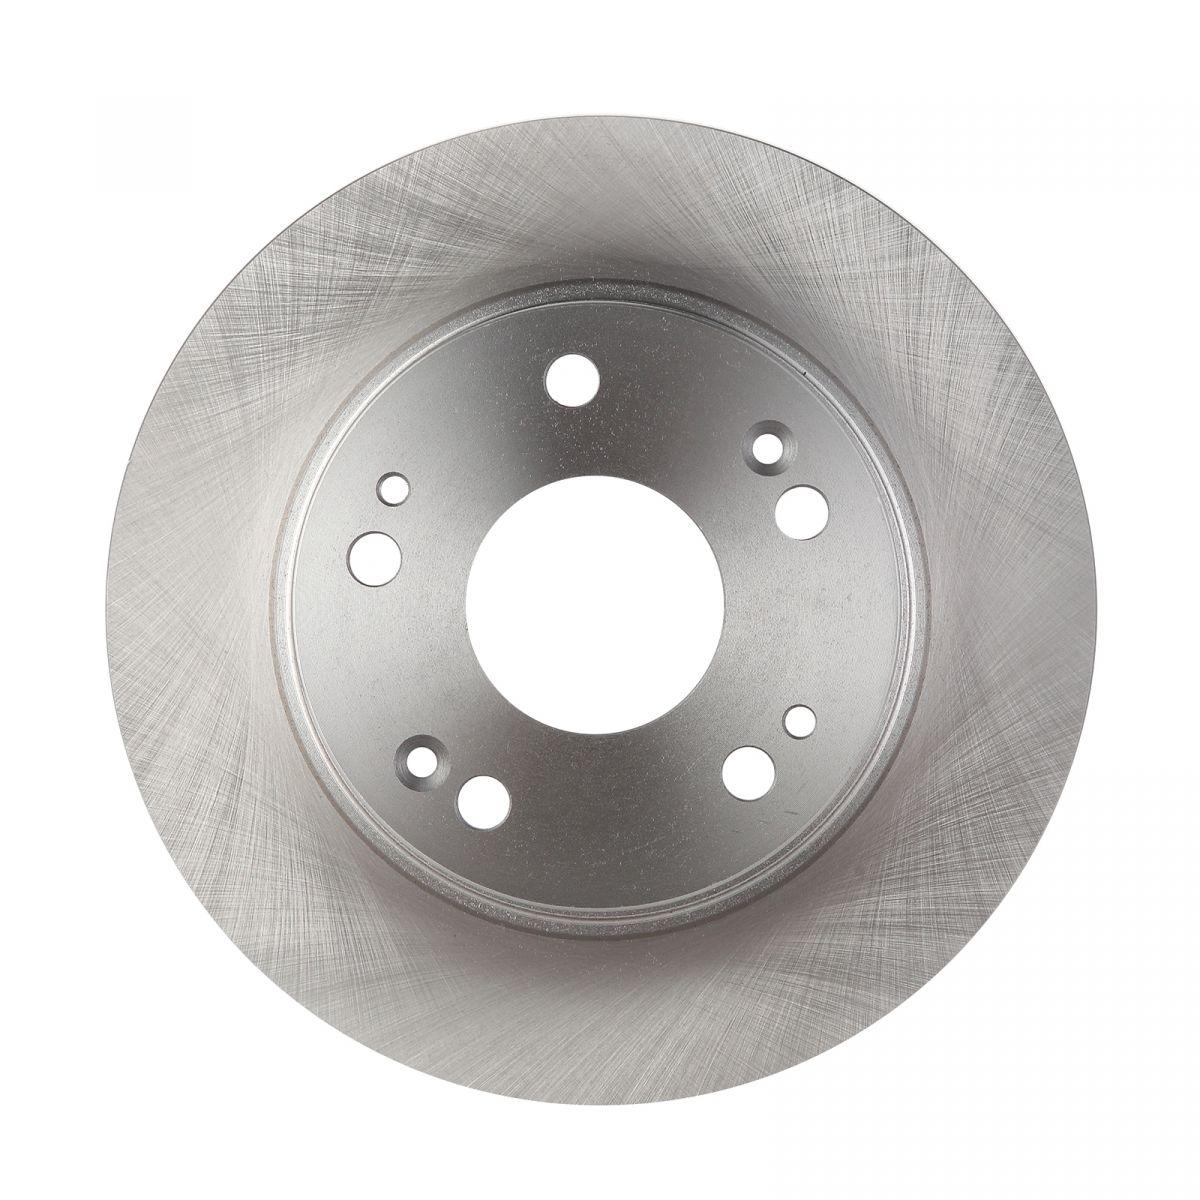 Rear Disc Brake Rotor Pair Set For Honda Accord Acura TSX